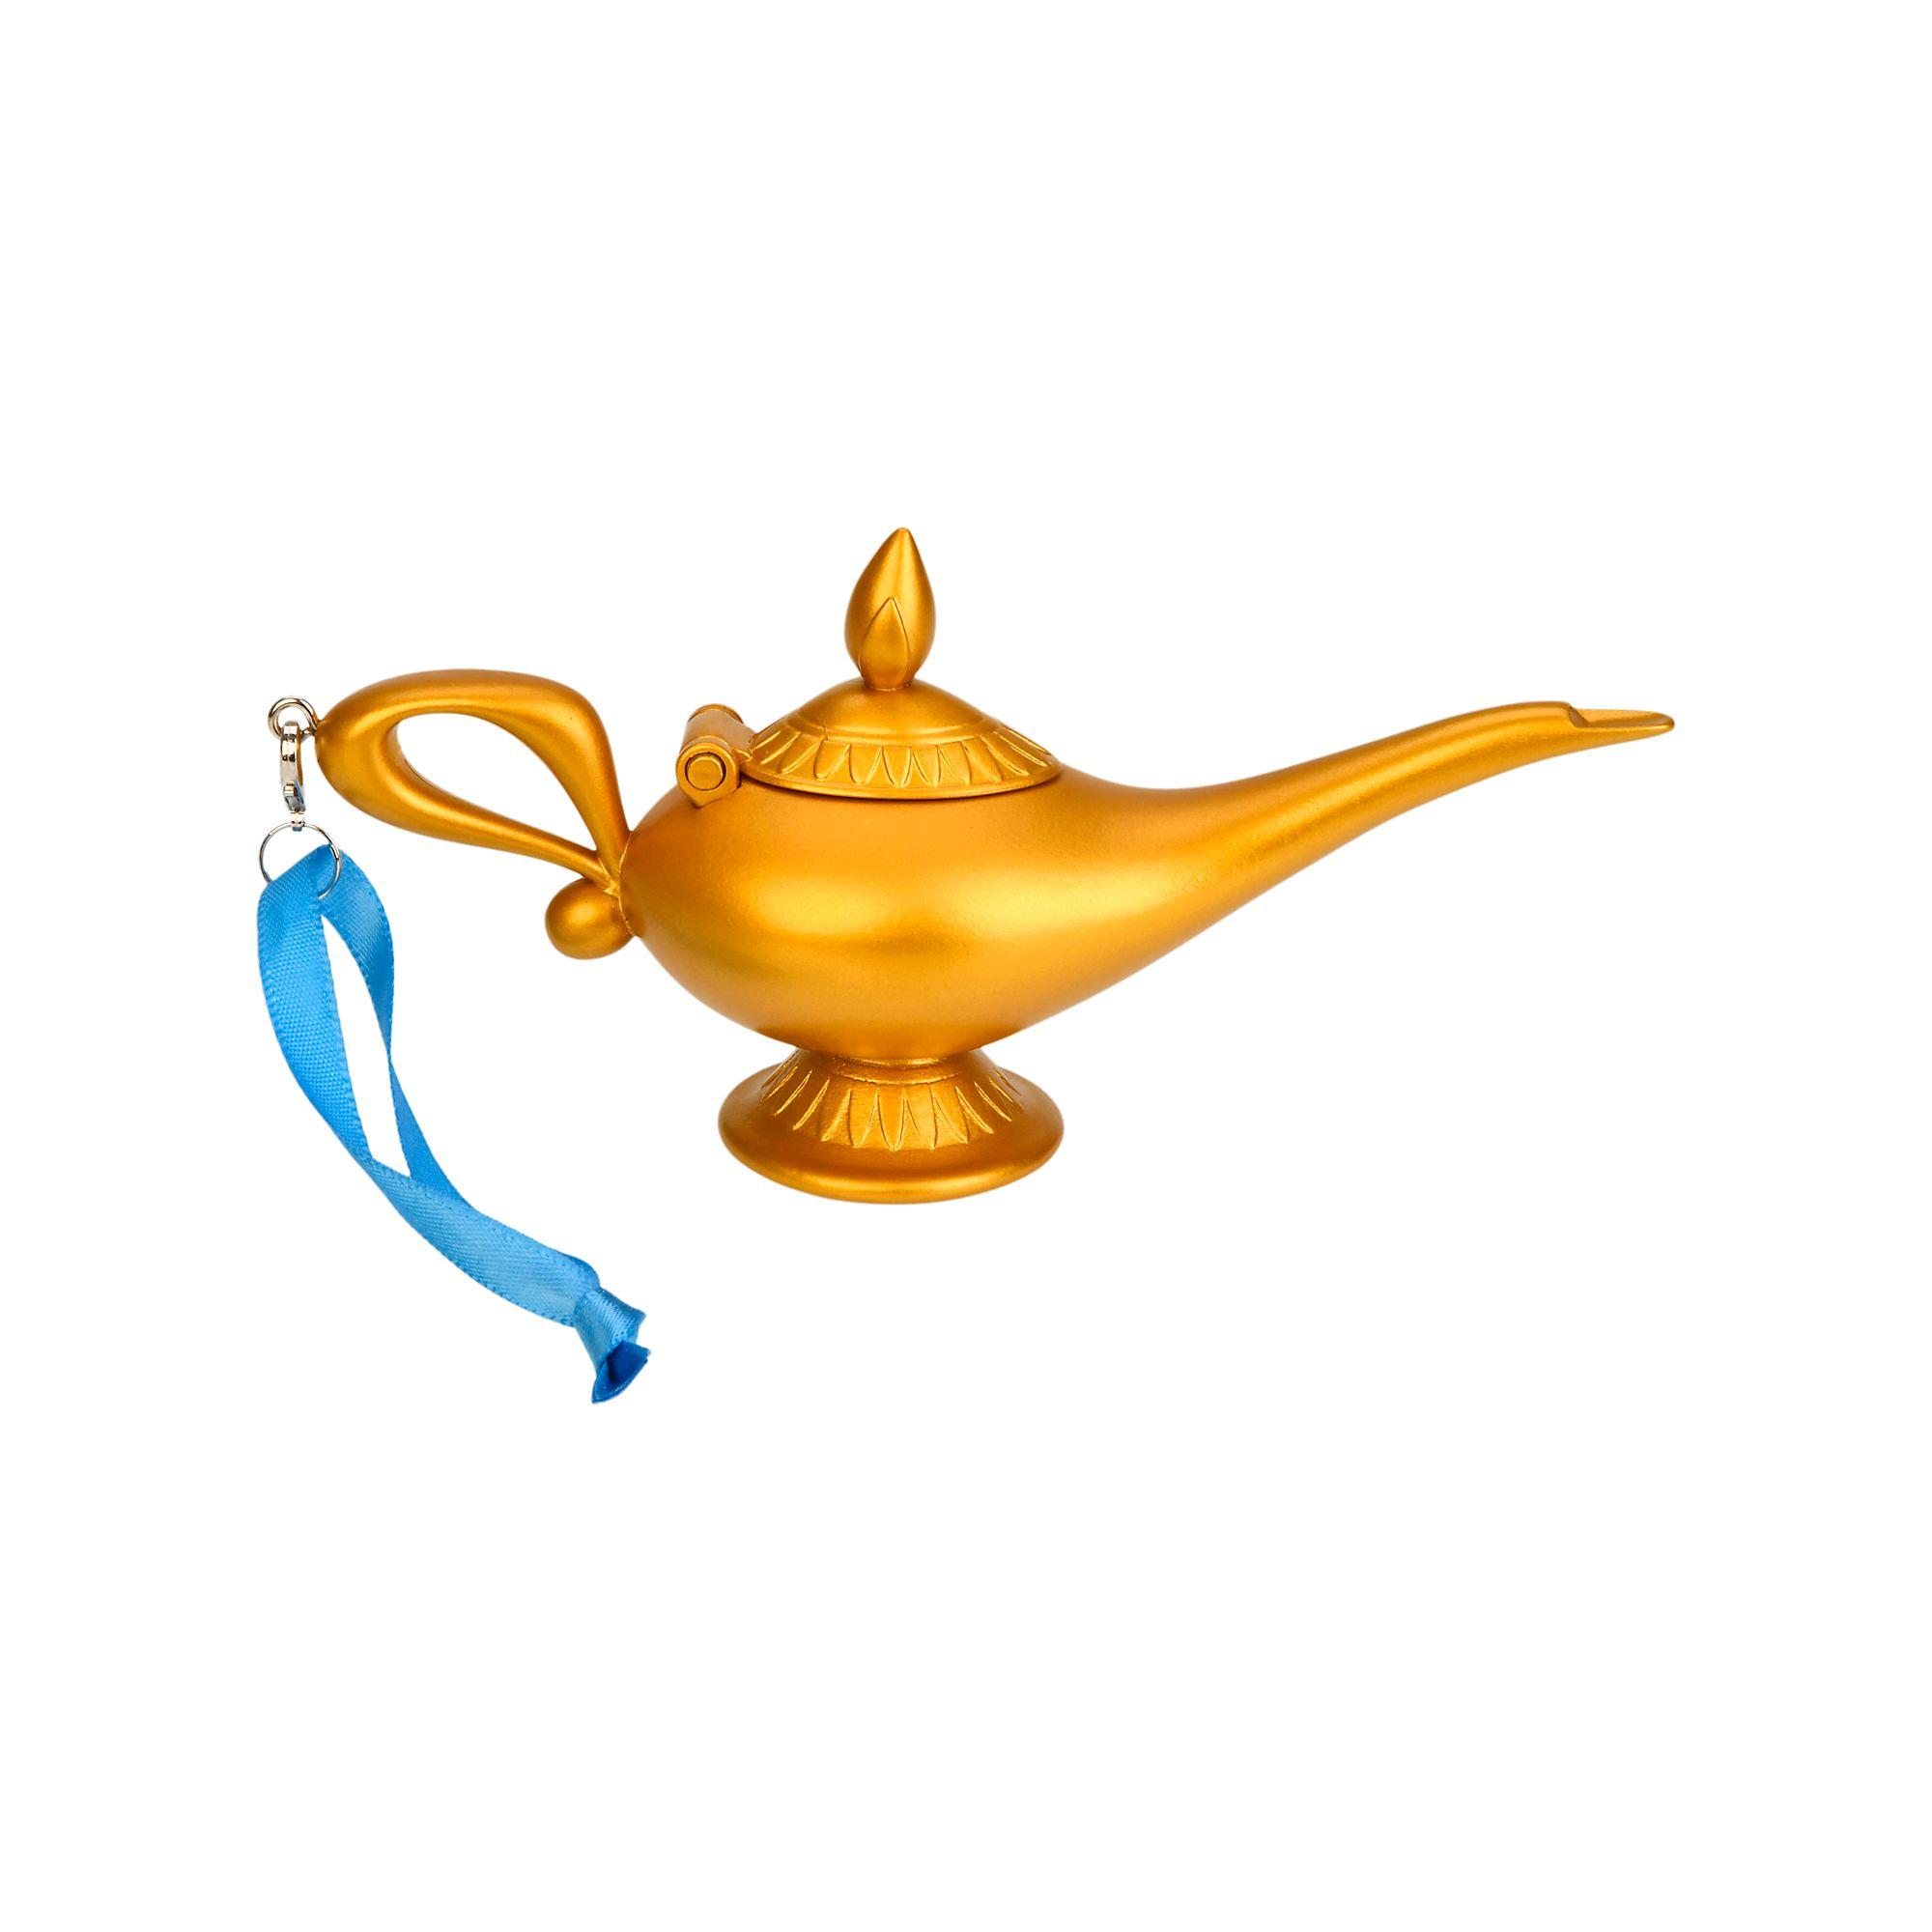 lampe-aladdin-decoration-sapin-noel-shop-disney